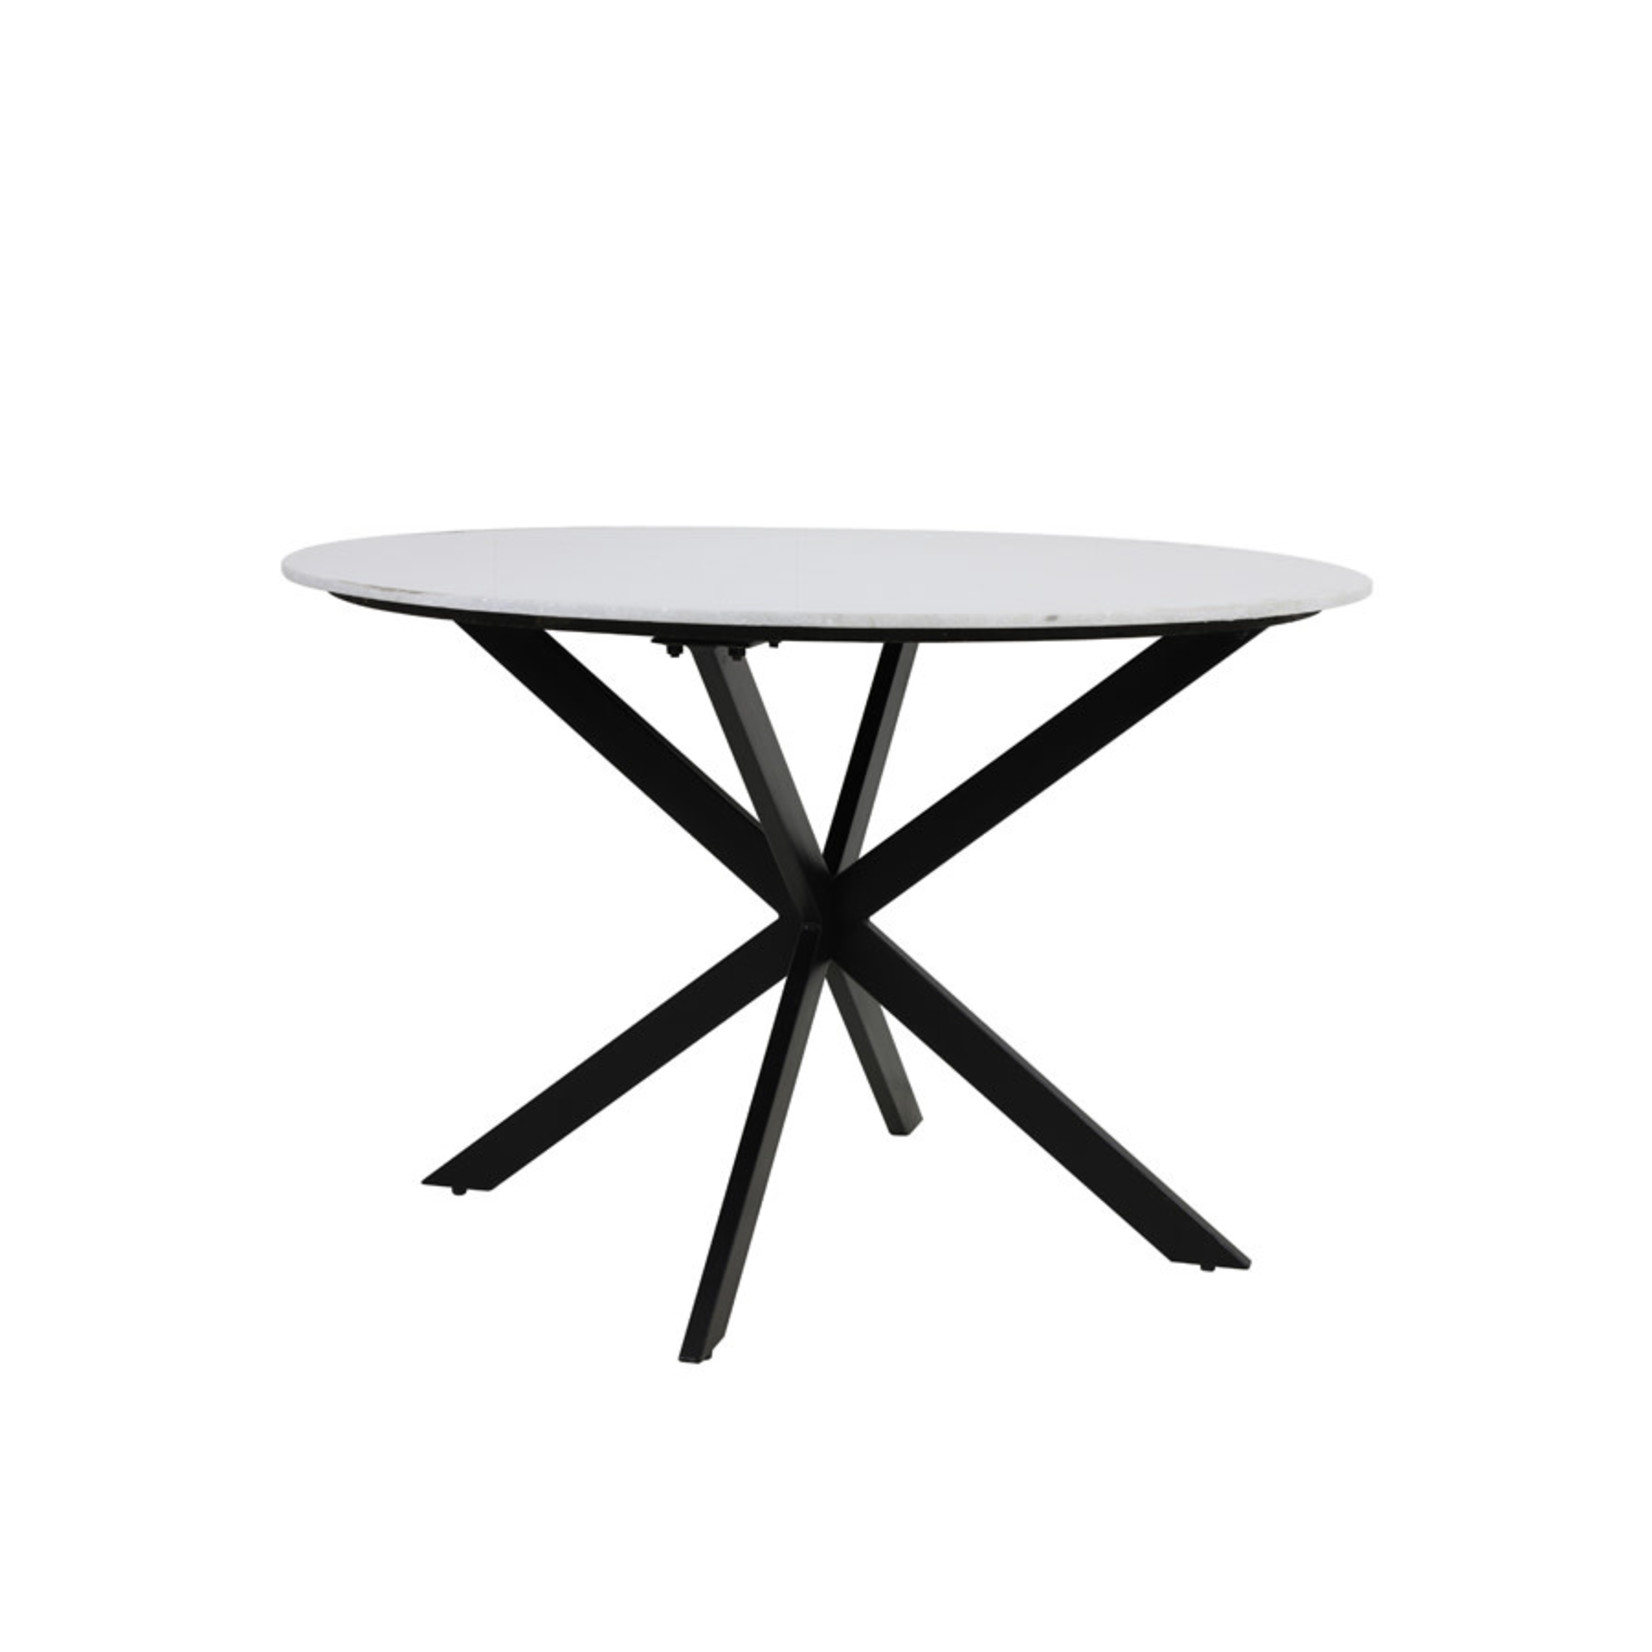 Light & Living Eettafel Ø120x78 cm TOMOCHI marmer wit+zwart